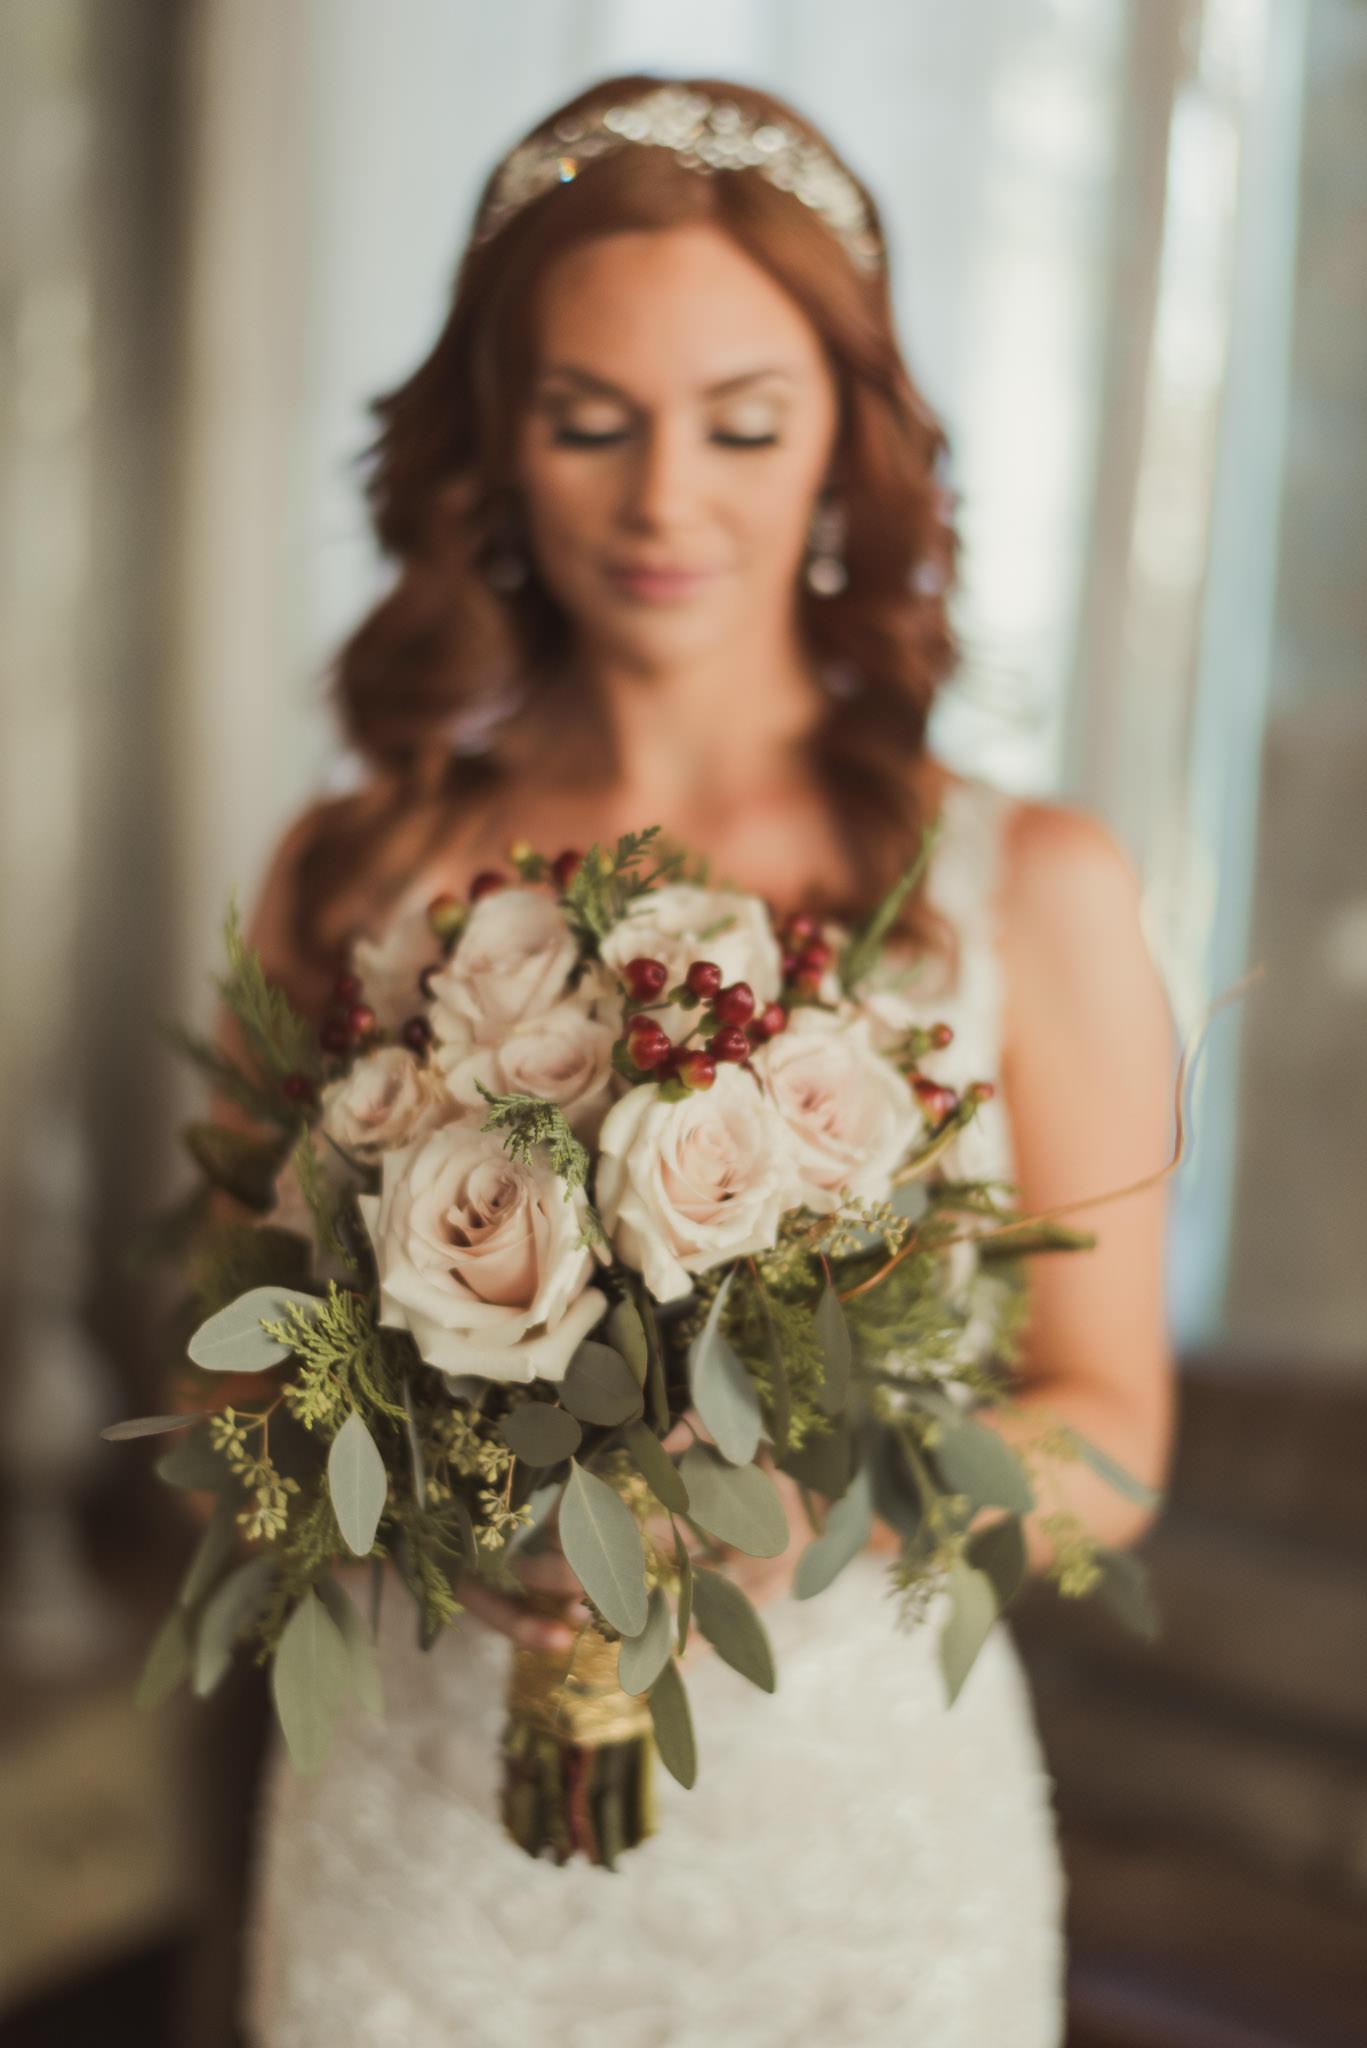 Cynthia-Curtis-Olde-Dobbine-Station-Houston-Wedding-Photographer-sm-38.jpg